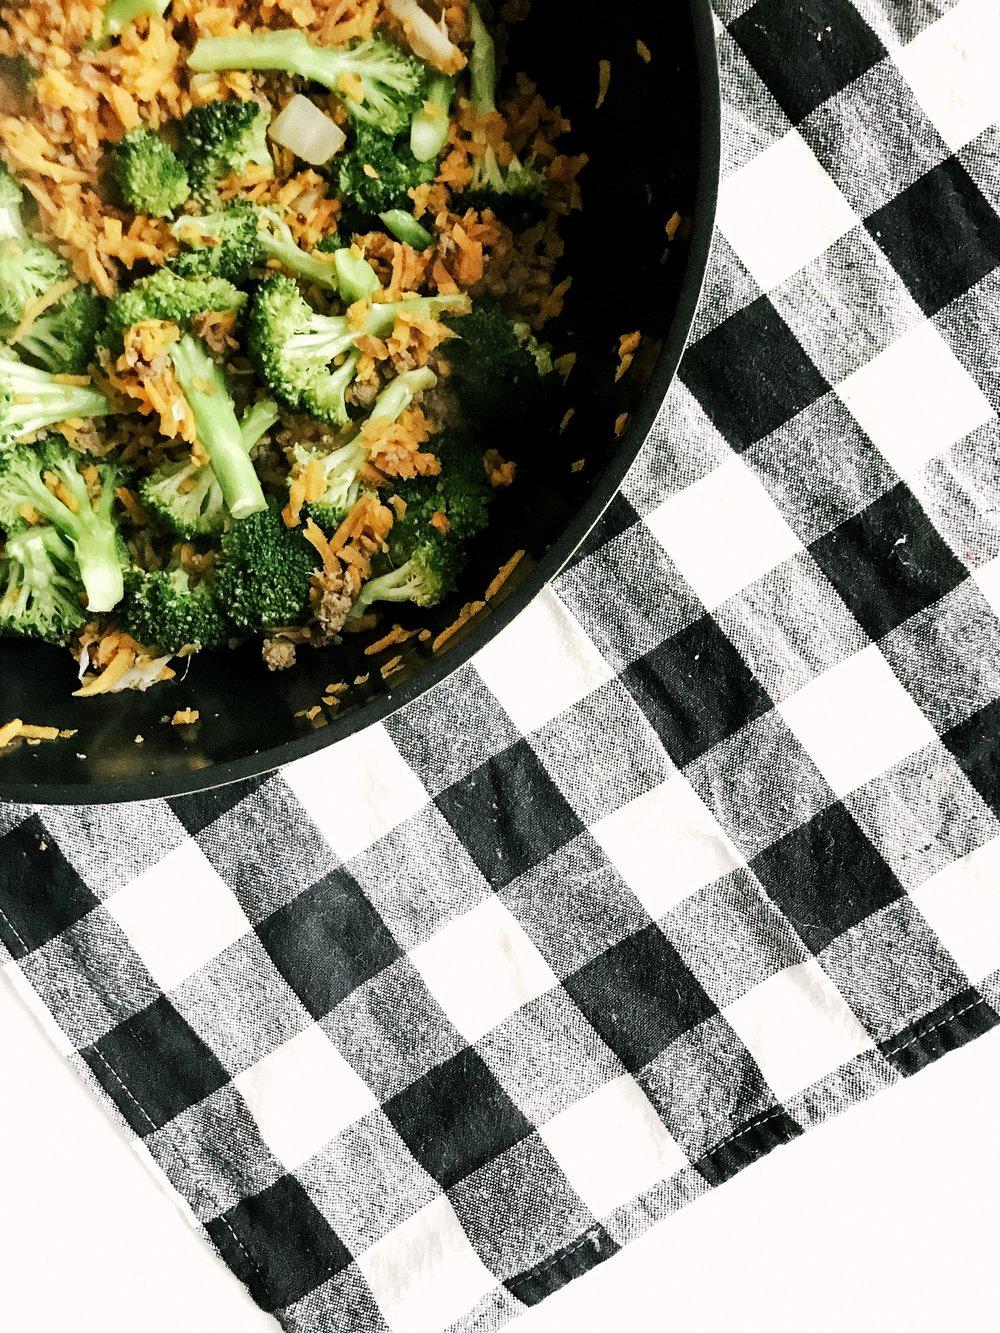 beef, broccoli & sweet potato skillet (aip, gluten-free, dairy-free, paleo)